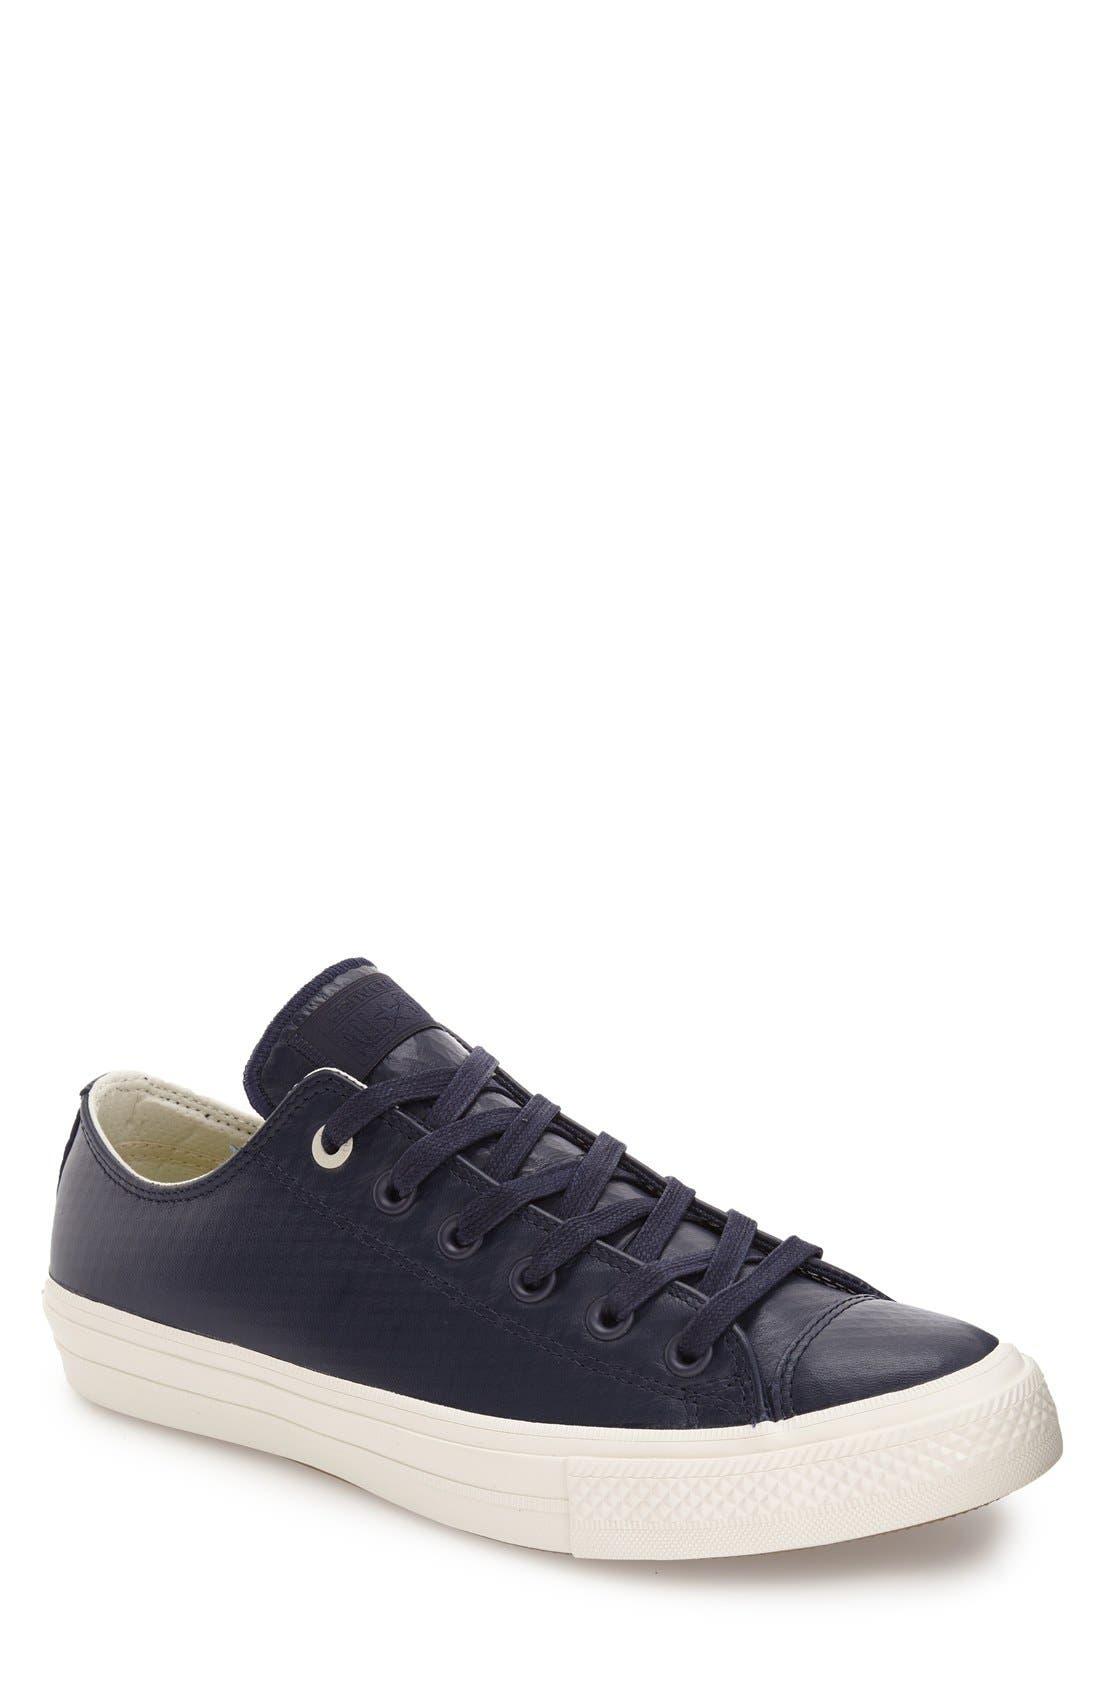 Alternate Image 1 Selected - Converse Chuck Taylor® All Star® II Sneaker (Men)